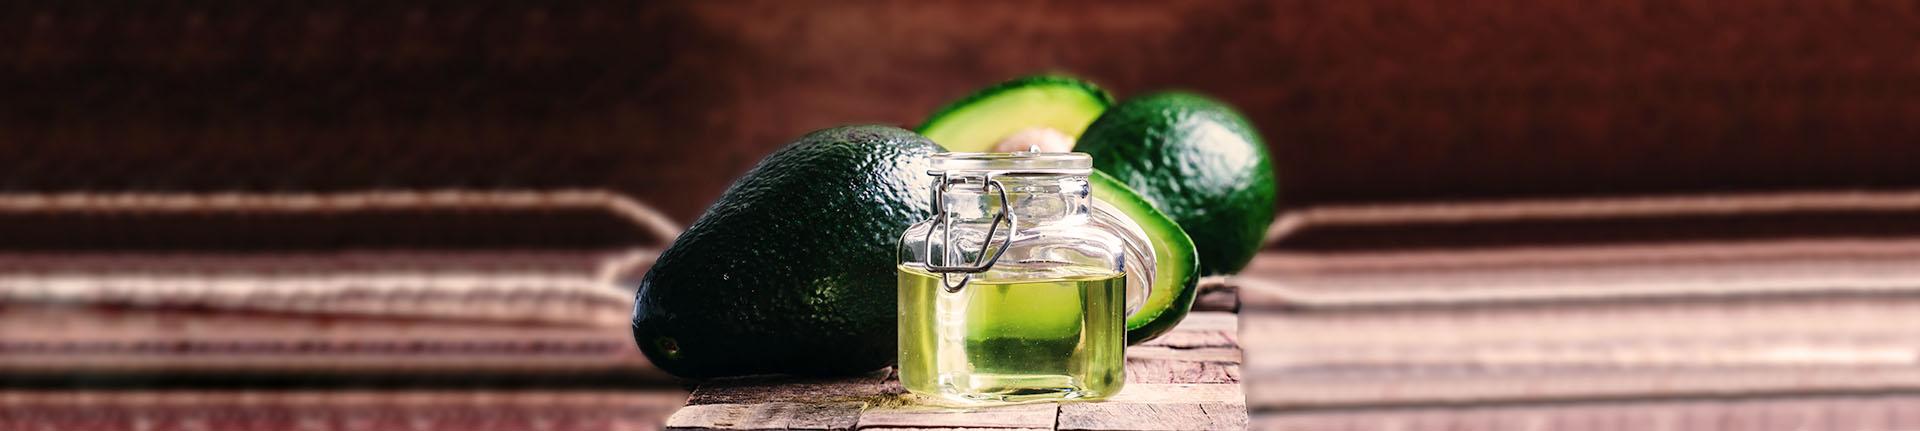 Abacate: hidratante natural para o corpo